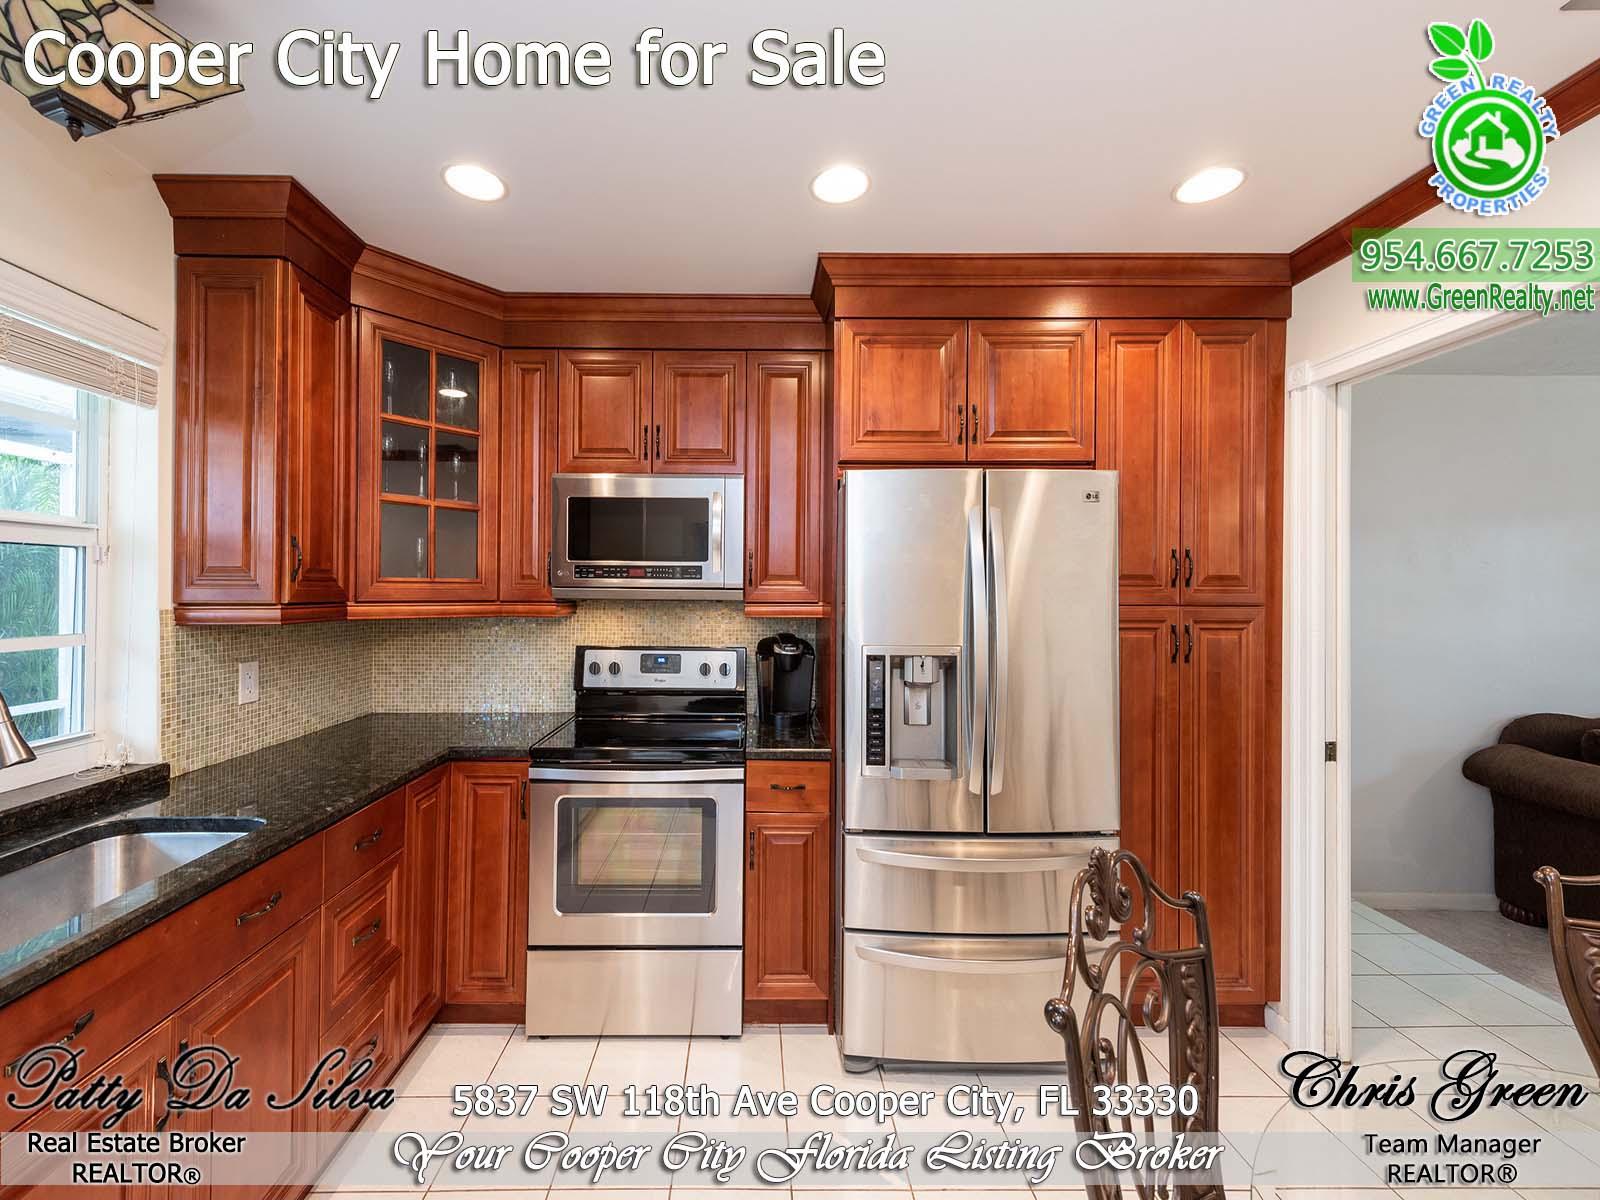 2 5837 SW 118th Ave Cooper City 33330 (9)